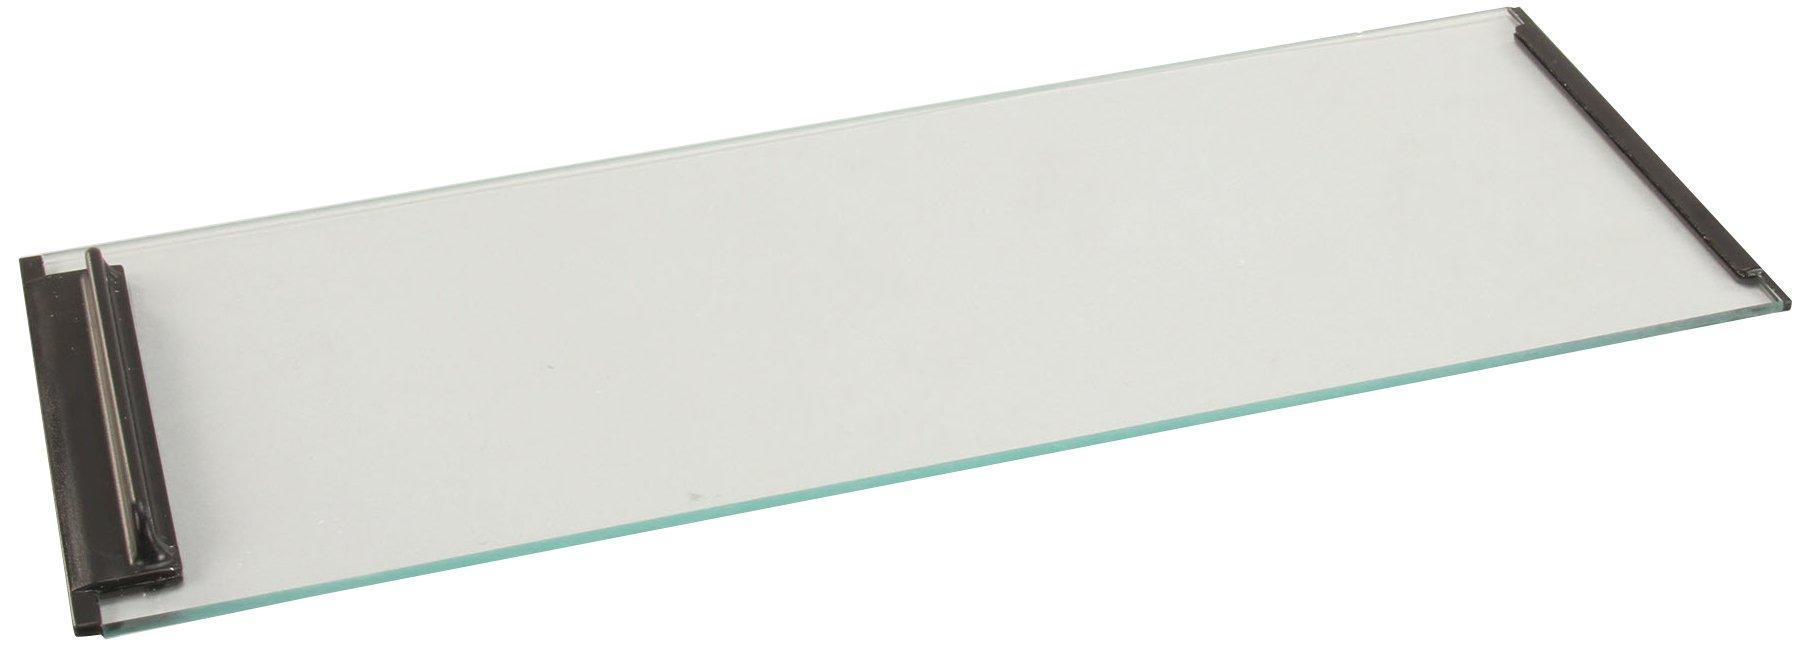 Hoshizaki 3R5019G09 Slide Glass by Hoshizaki